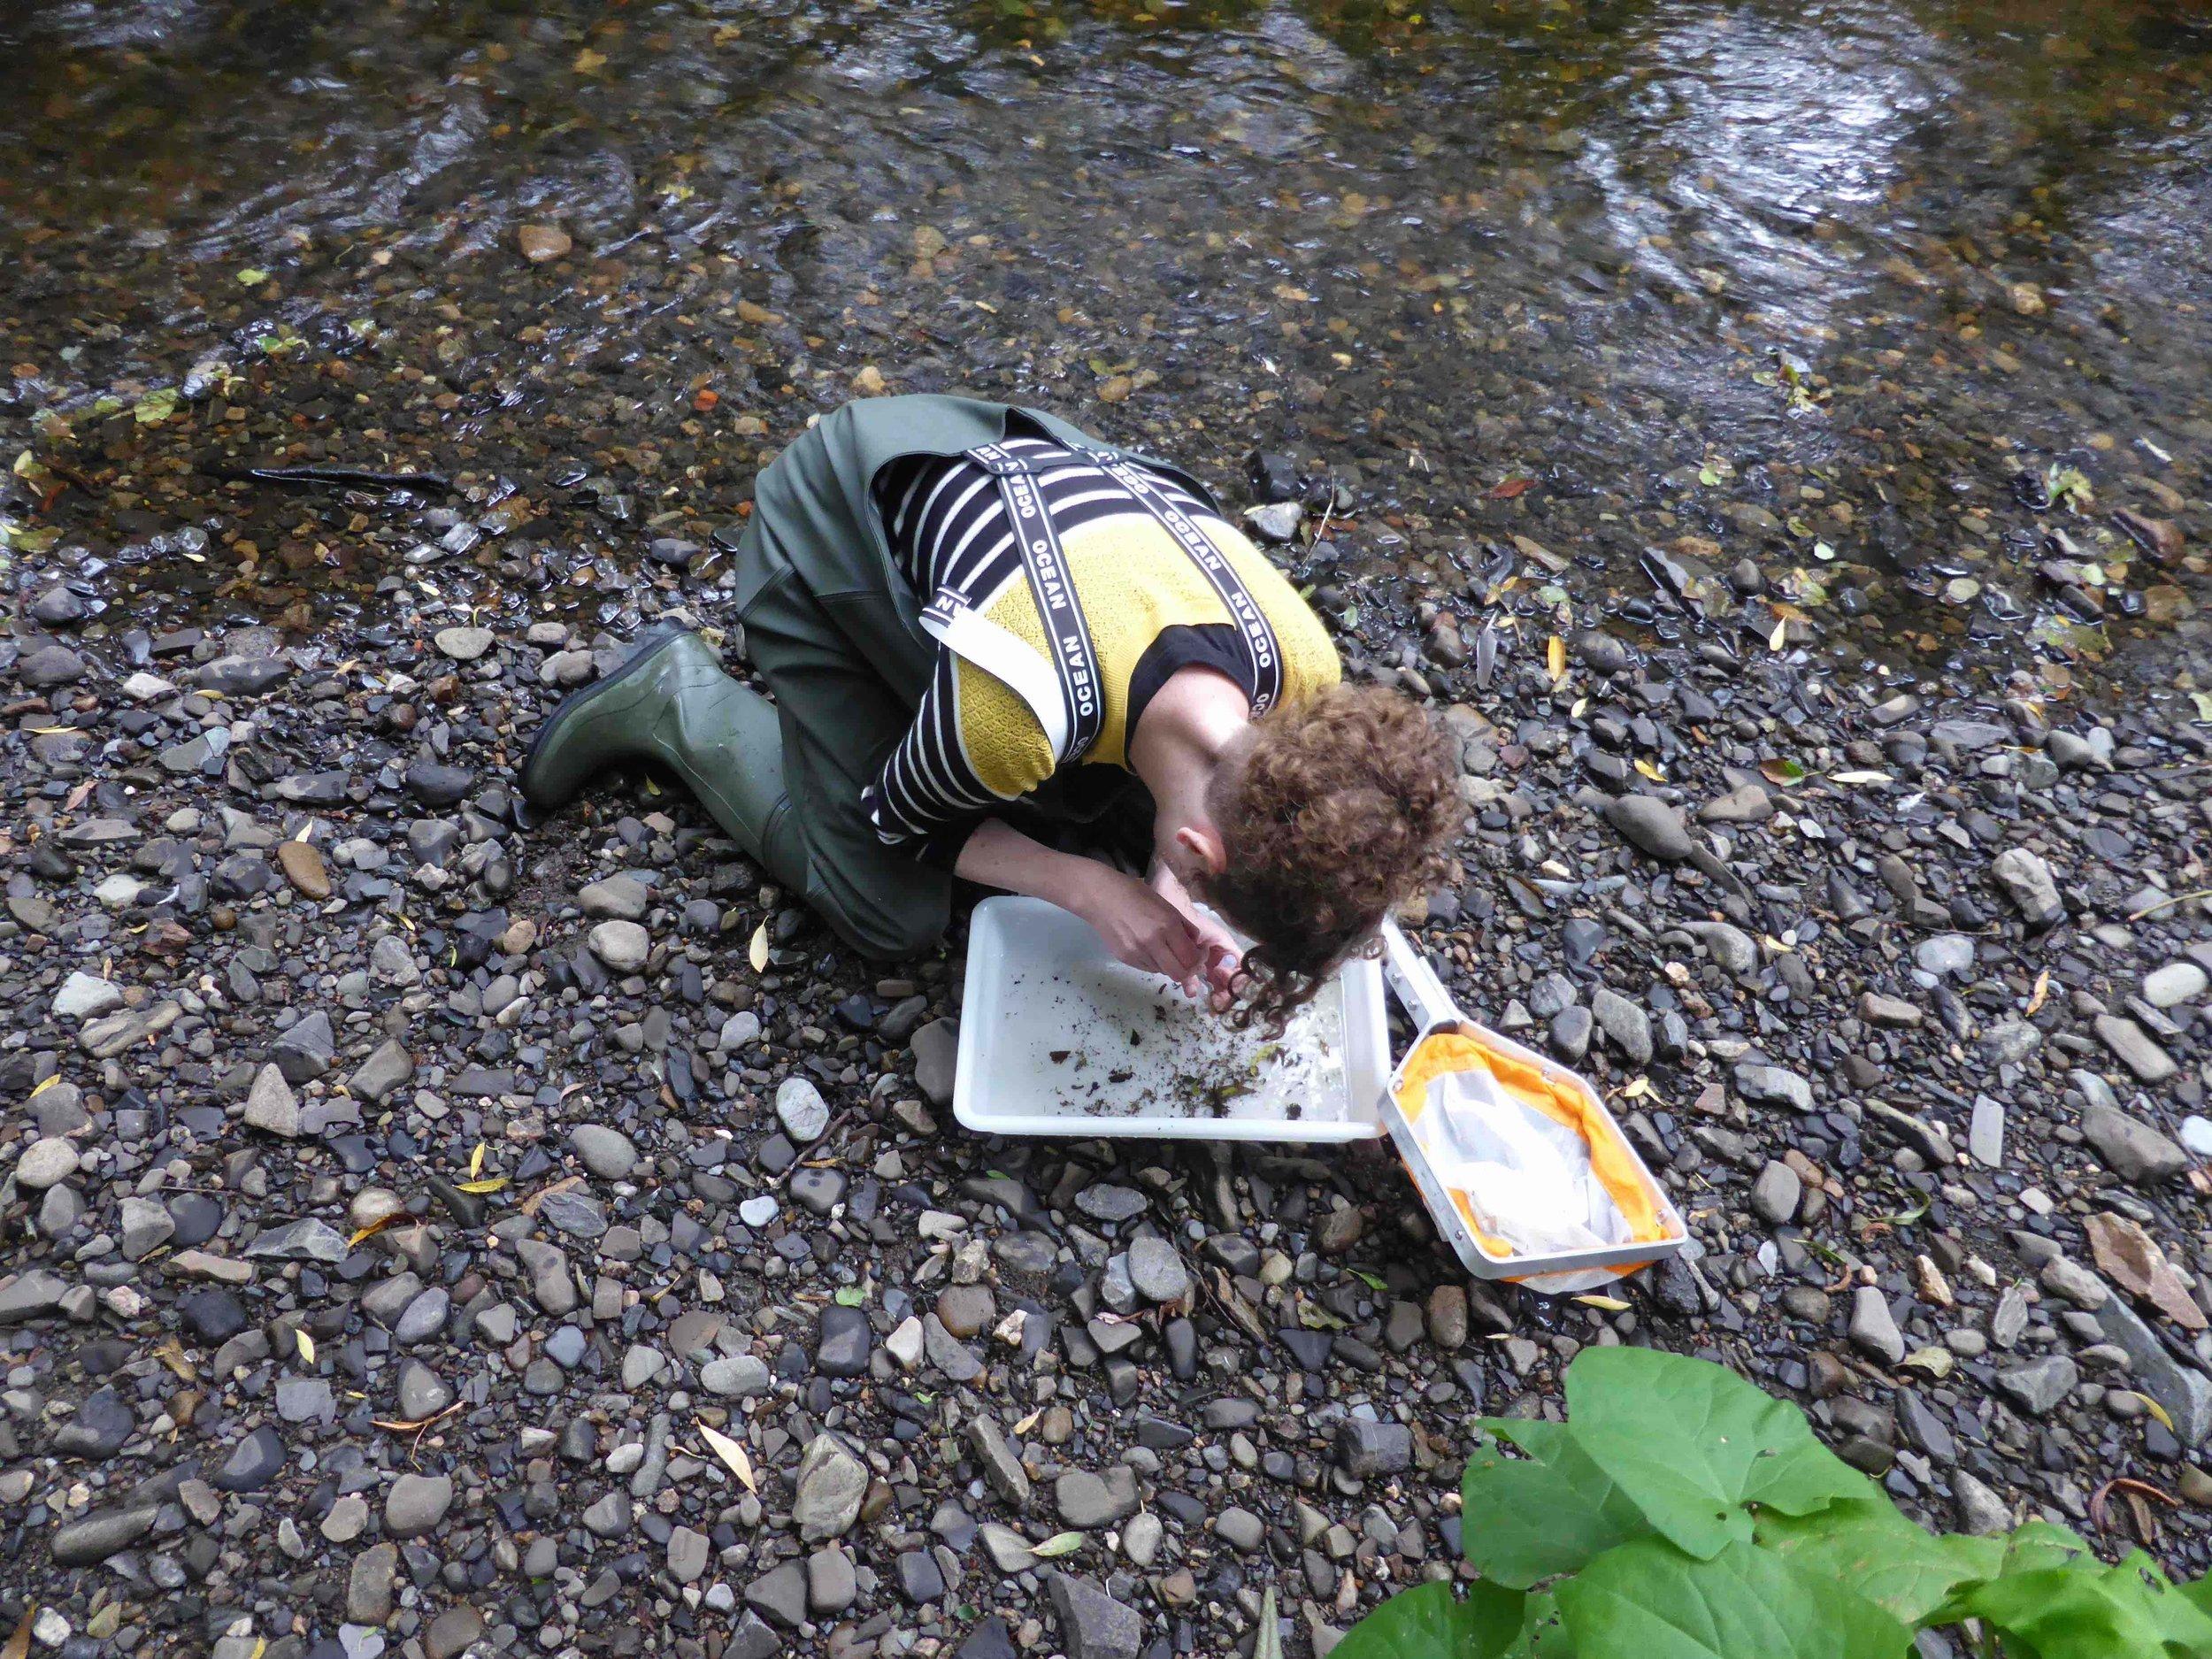 Surveying water beetles at Dodder Wet Woodland pNHA